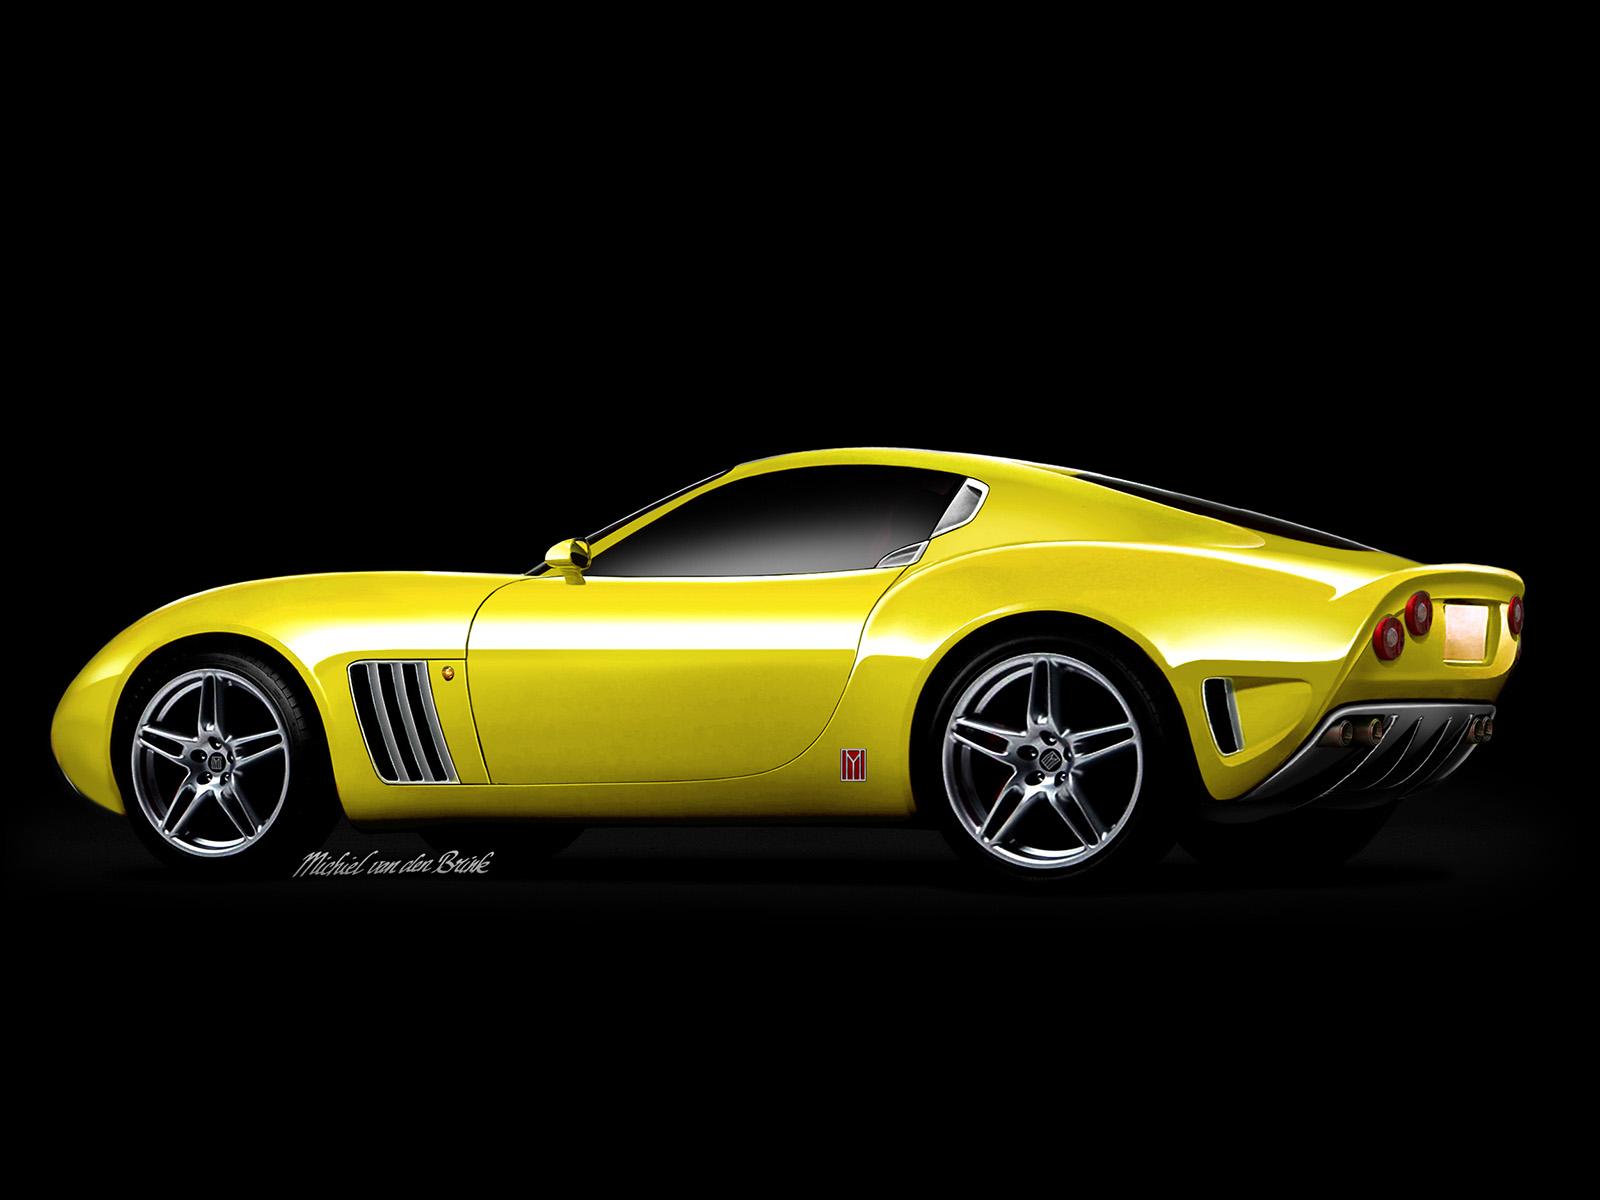 2007 Vandenbrink 599 GTO Mugello Concept Image